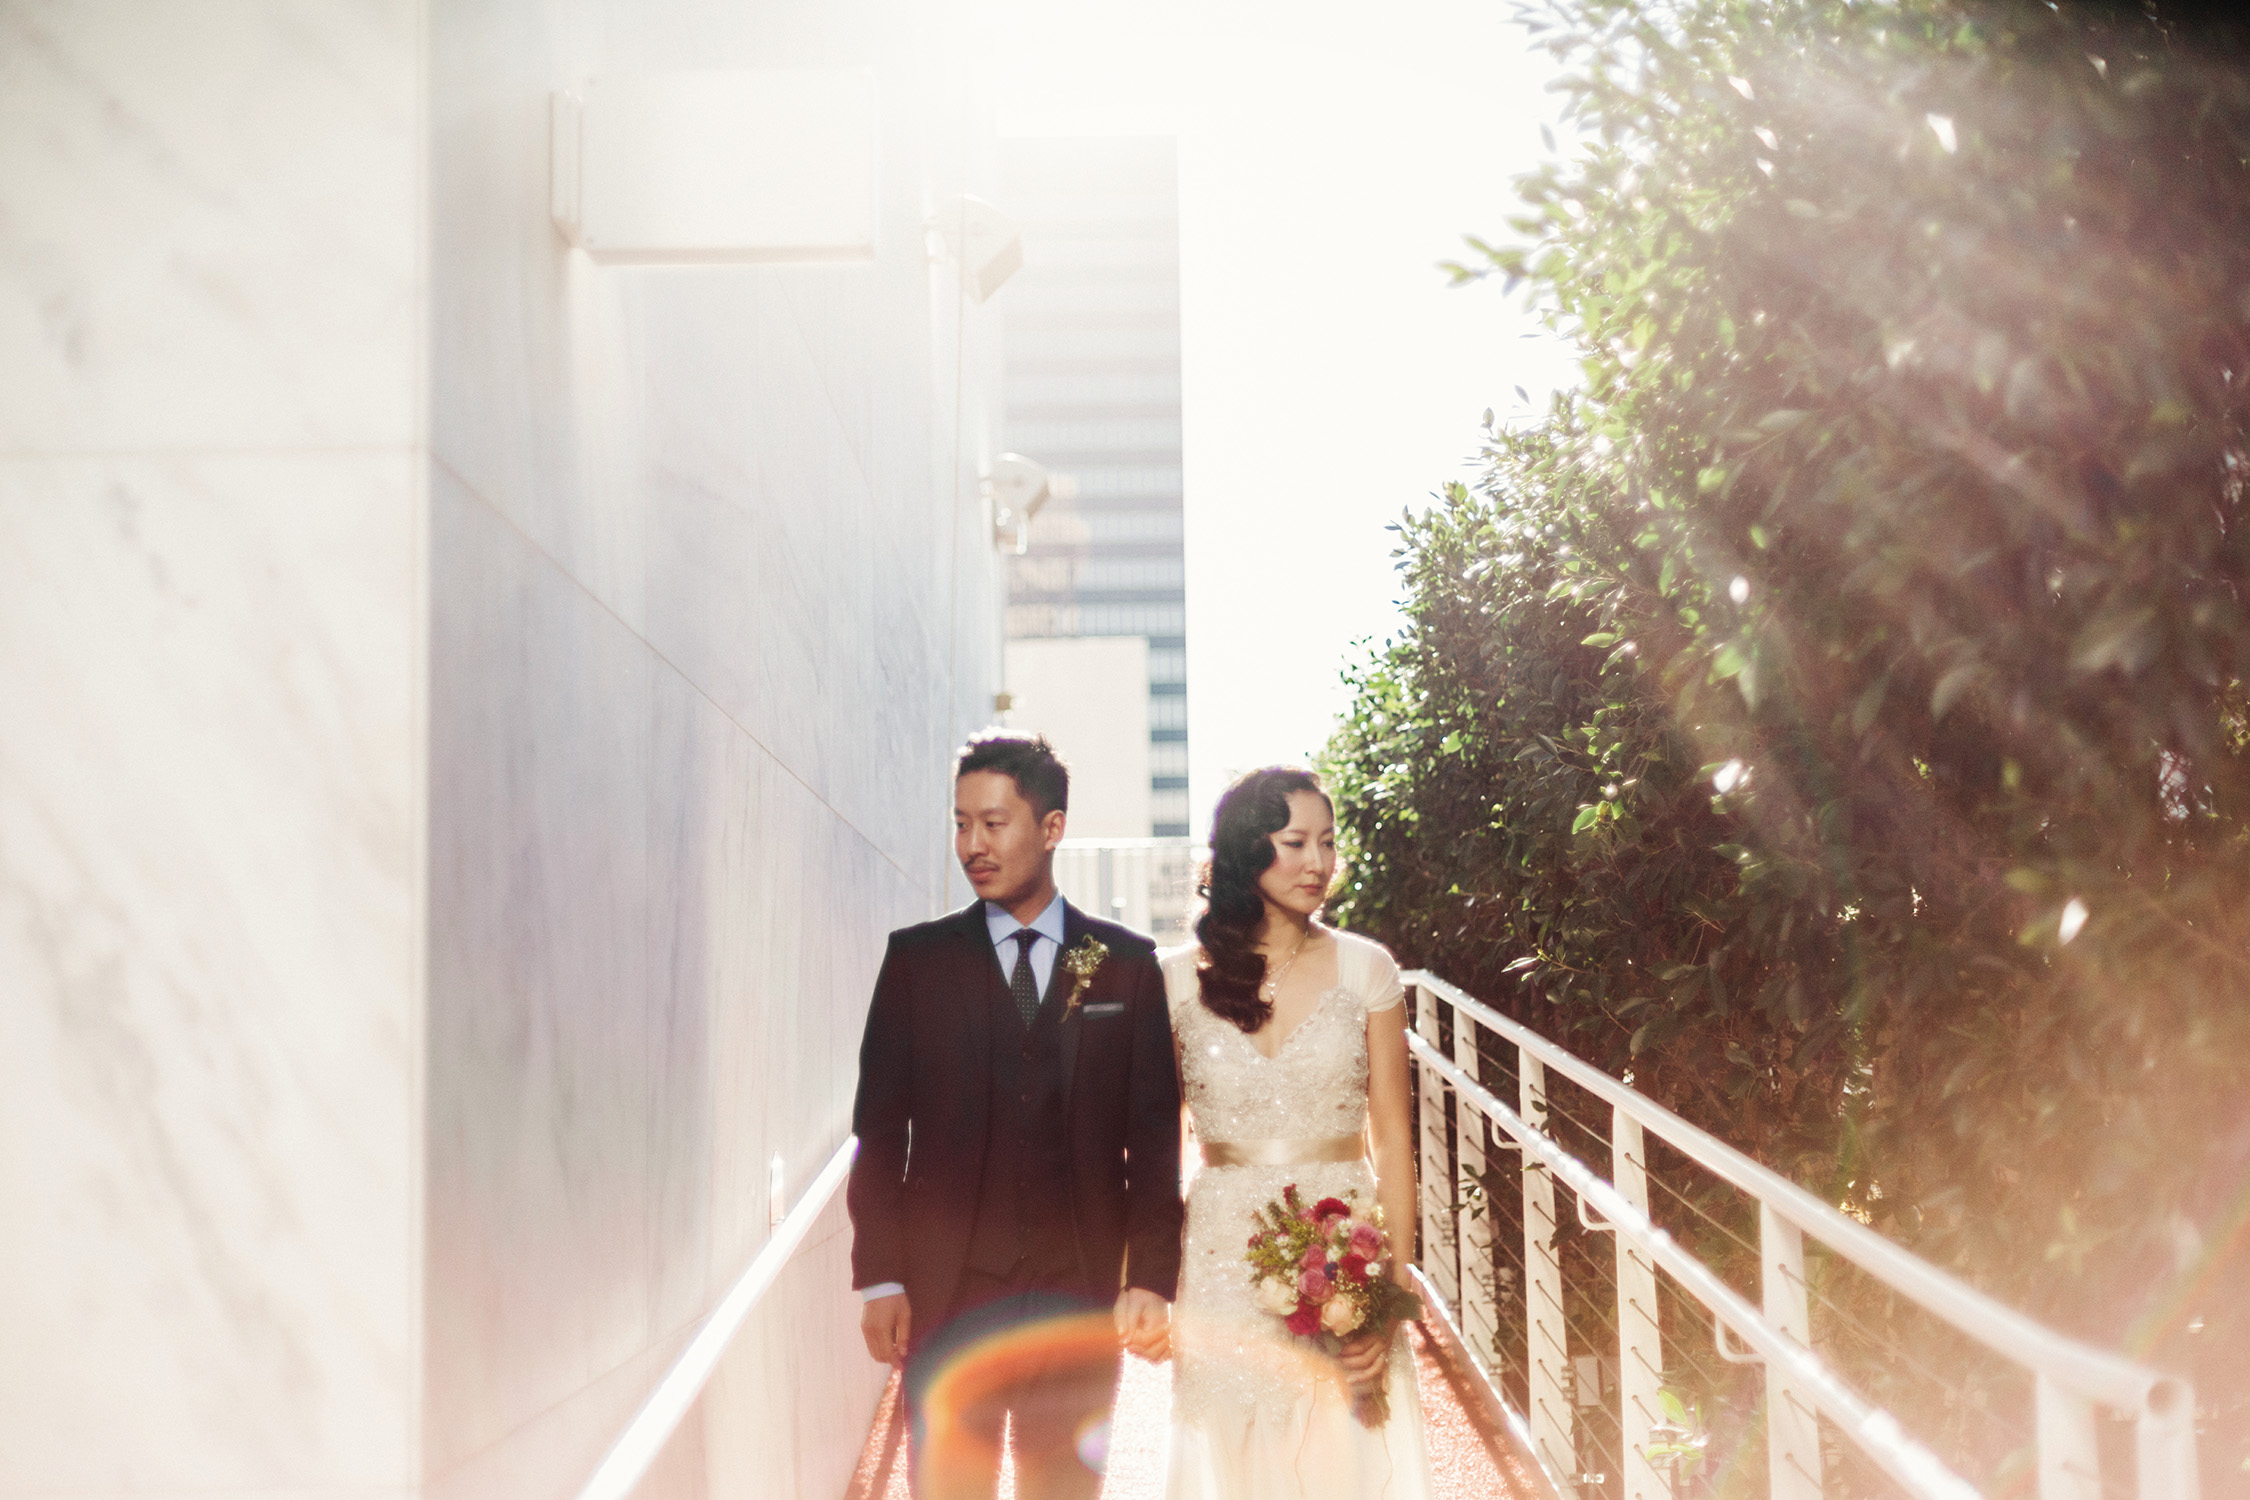 Standard_LA_wedding198.JPG